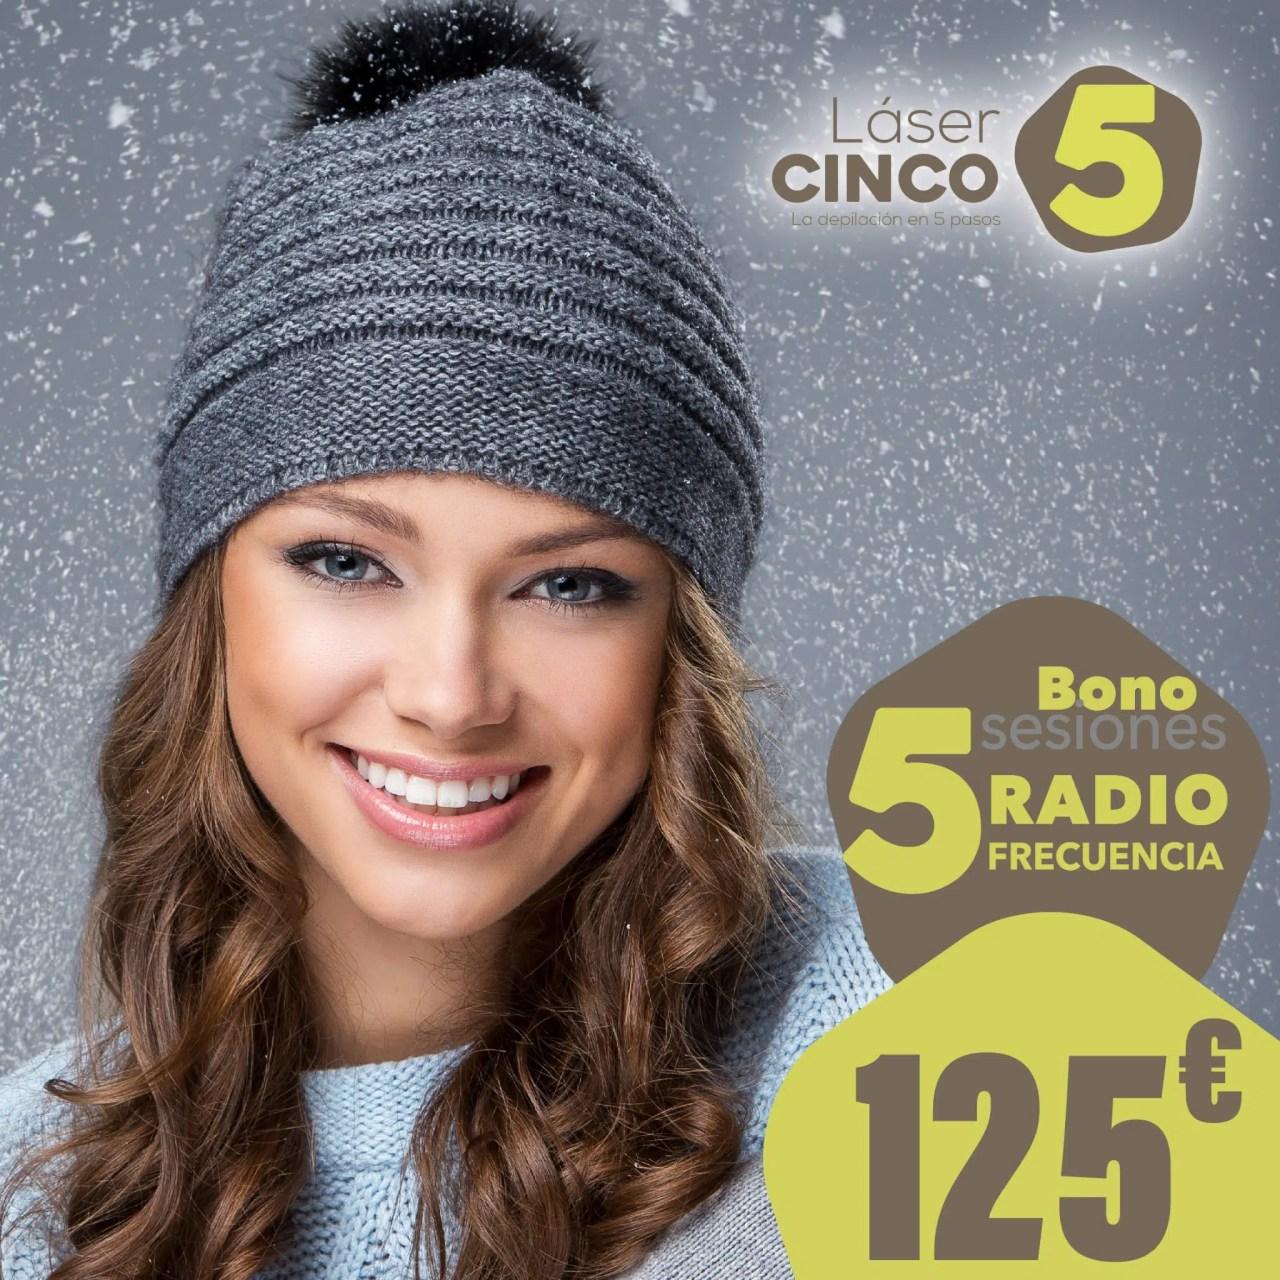 Promoción Radiofrecuencia